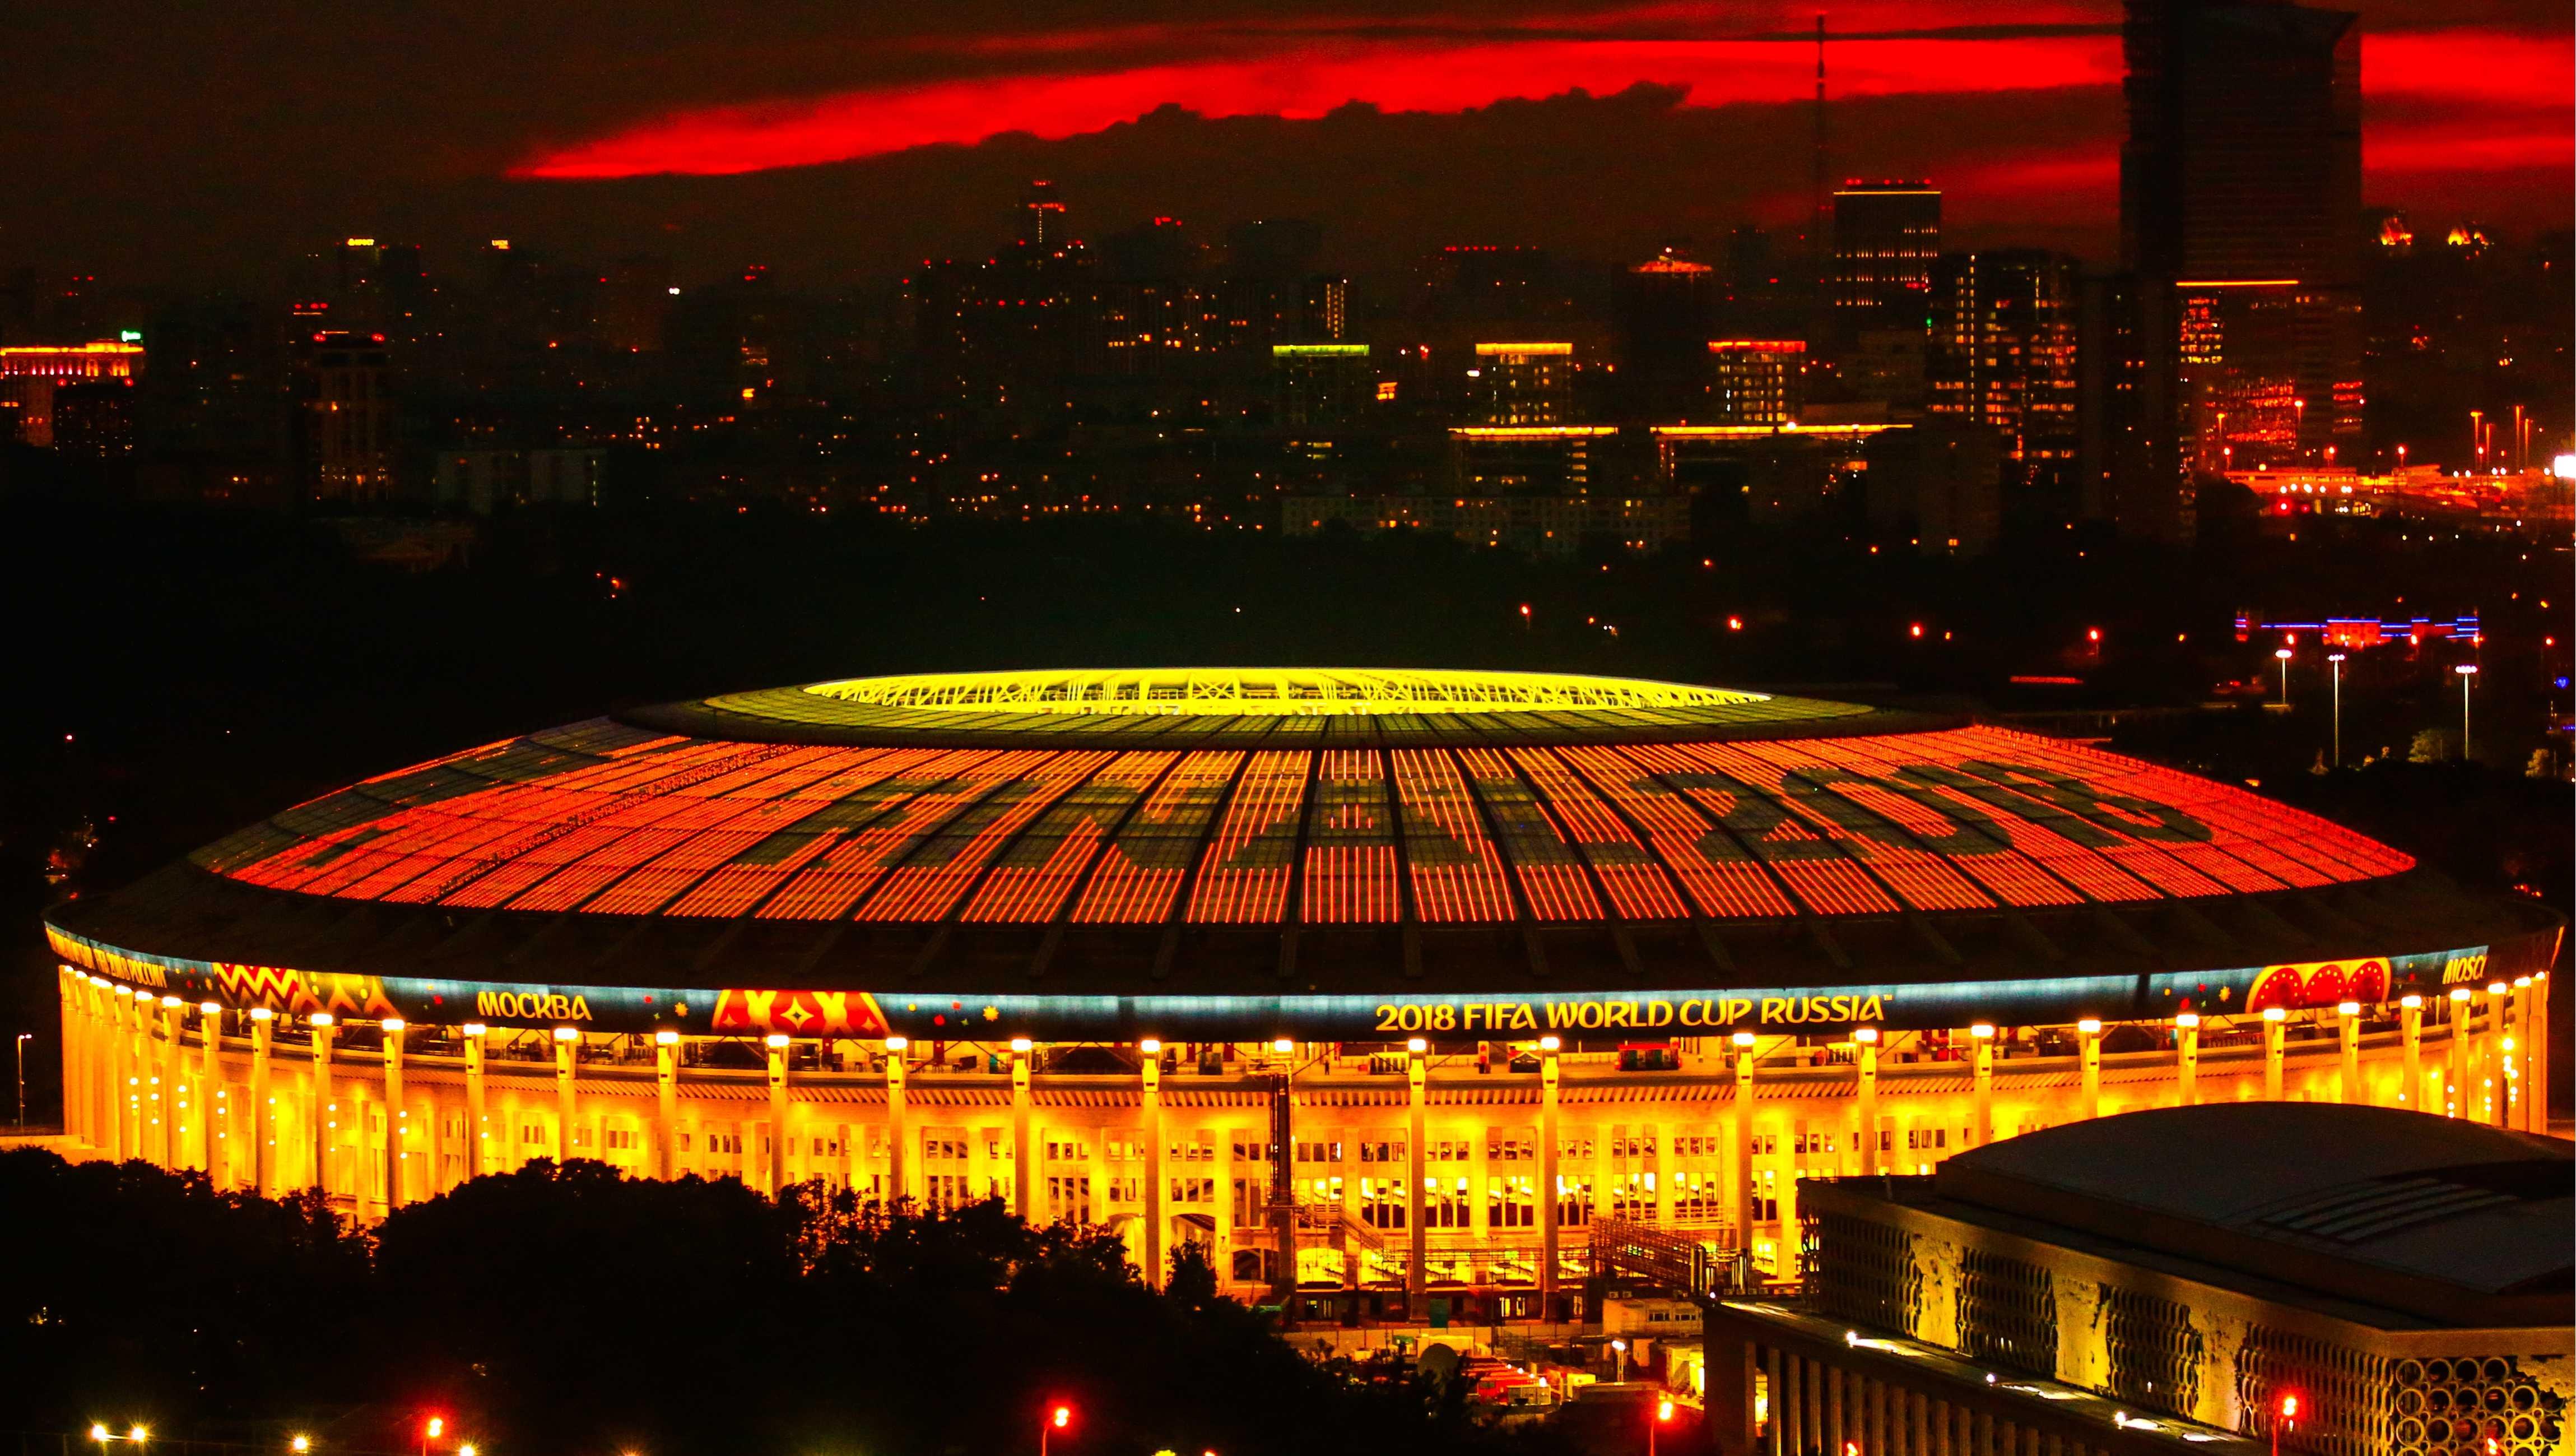 World-cup-stadium-1531654993.jpg?crop=1.00xw:0